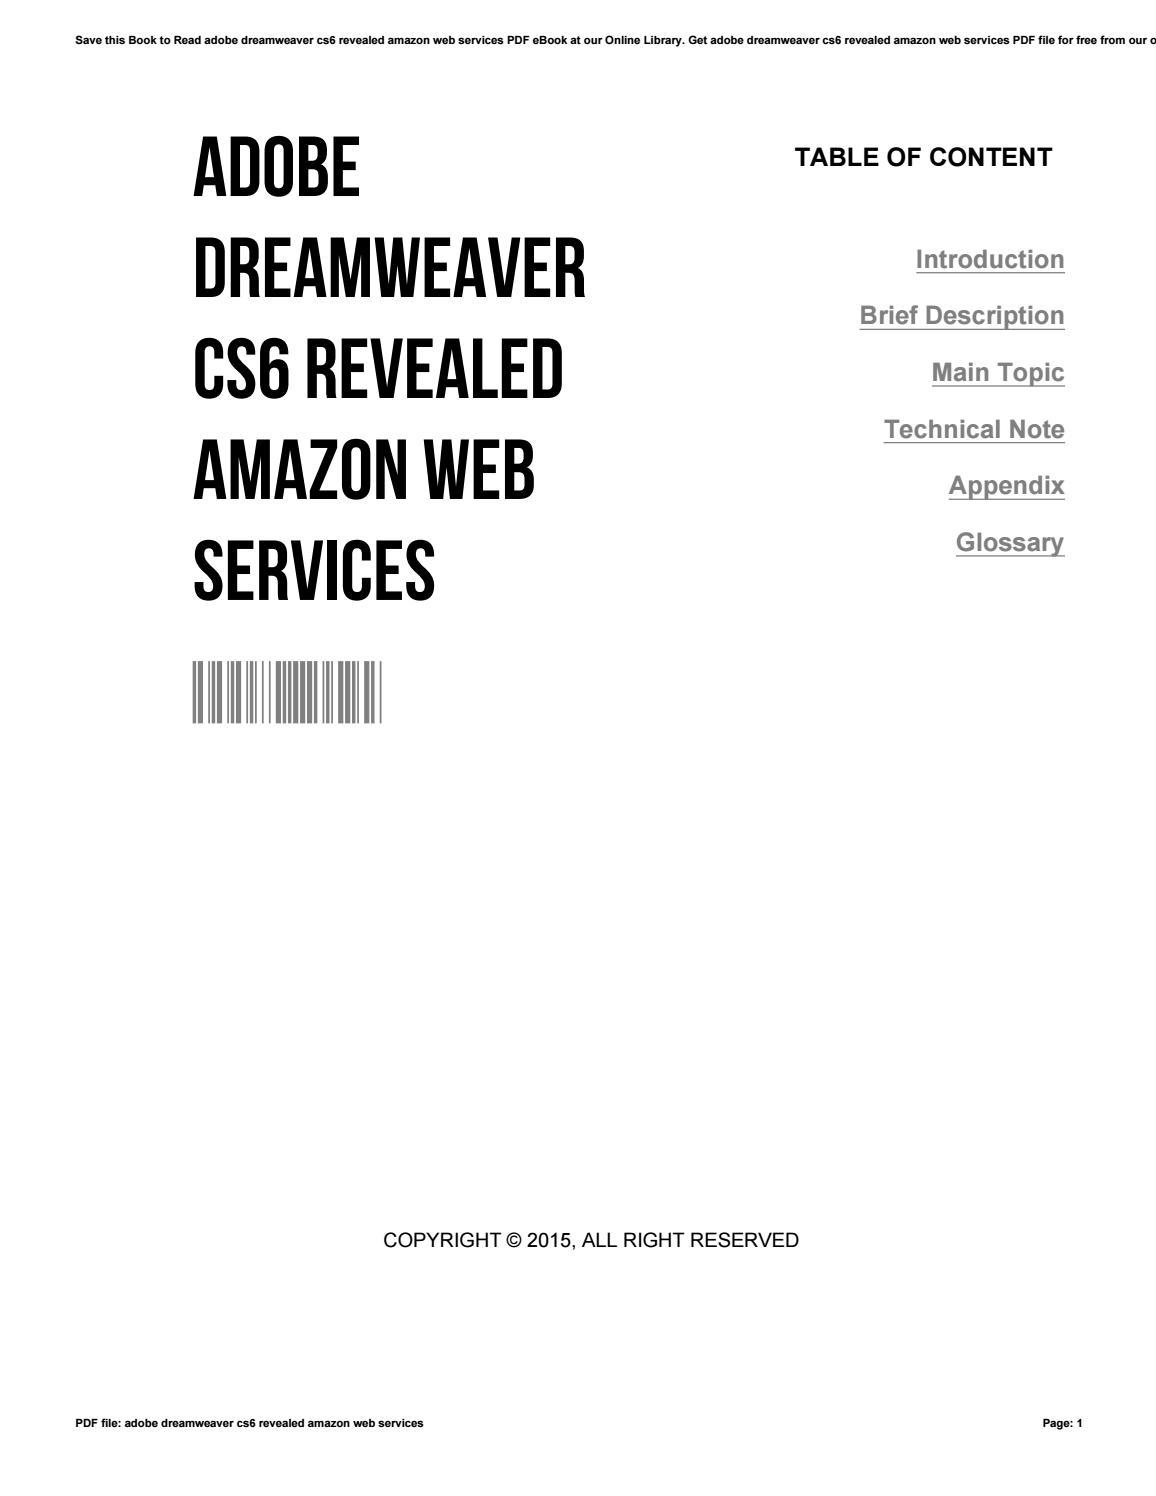 Adobe Dreamweaver Cs6 Revealed Pdf